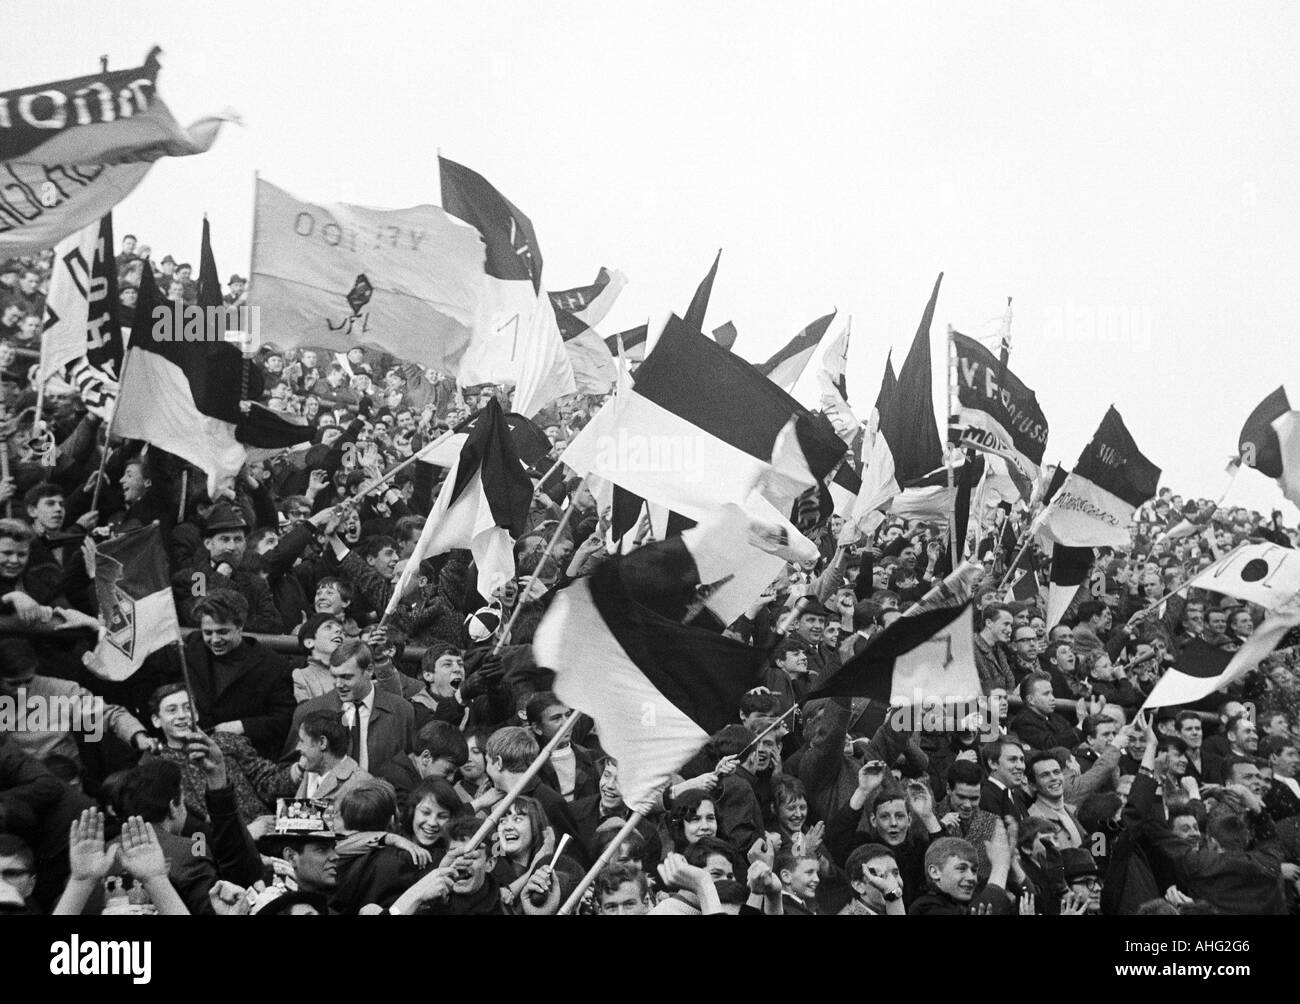 football, Bundesliga, 1966/1967, Borussia Moenchengladbach versus Hanover 96 2:0, Boekelberg Stadium, crowd of spectators, Moenchengladbach fans waving their club flags - Stock Image